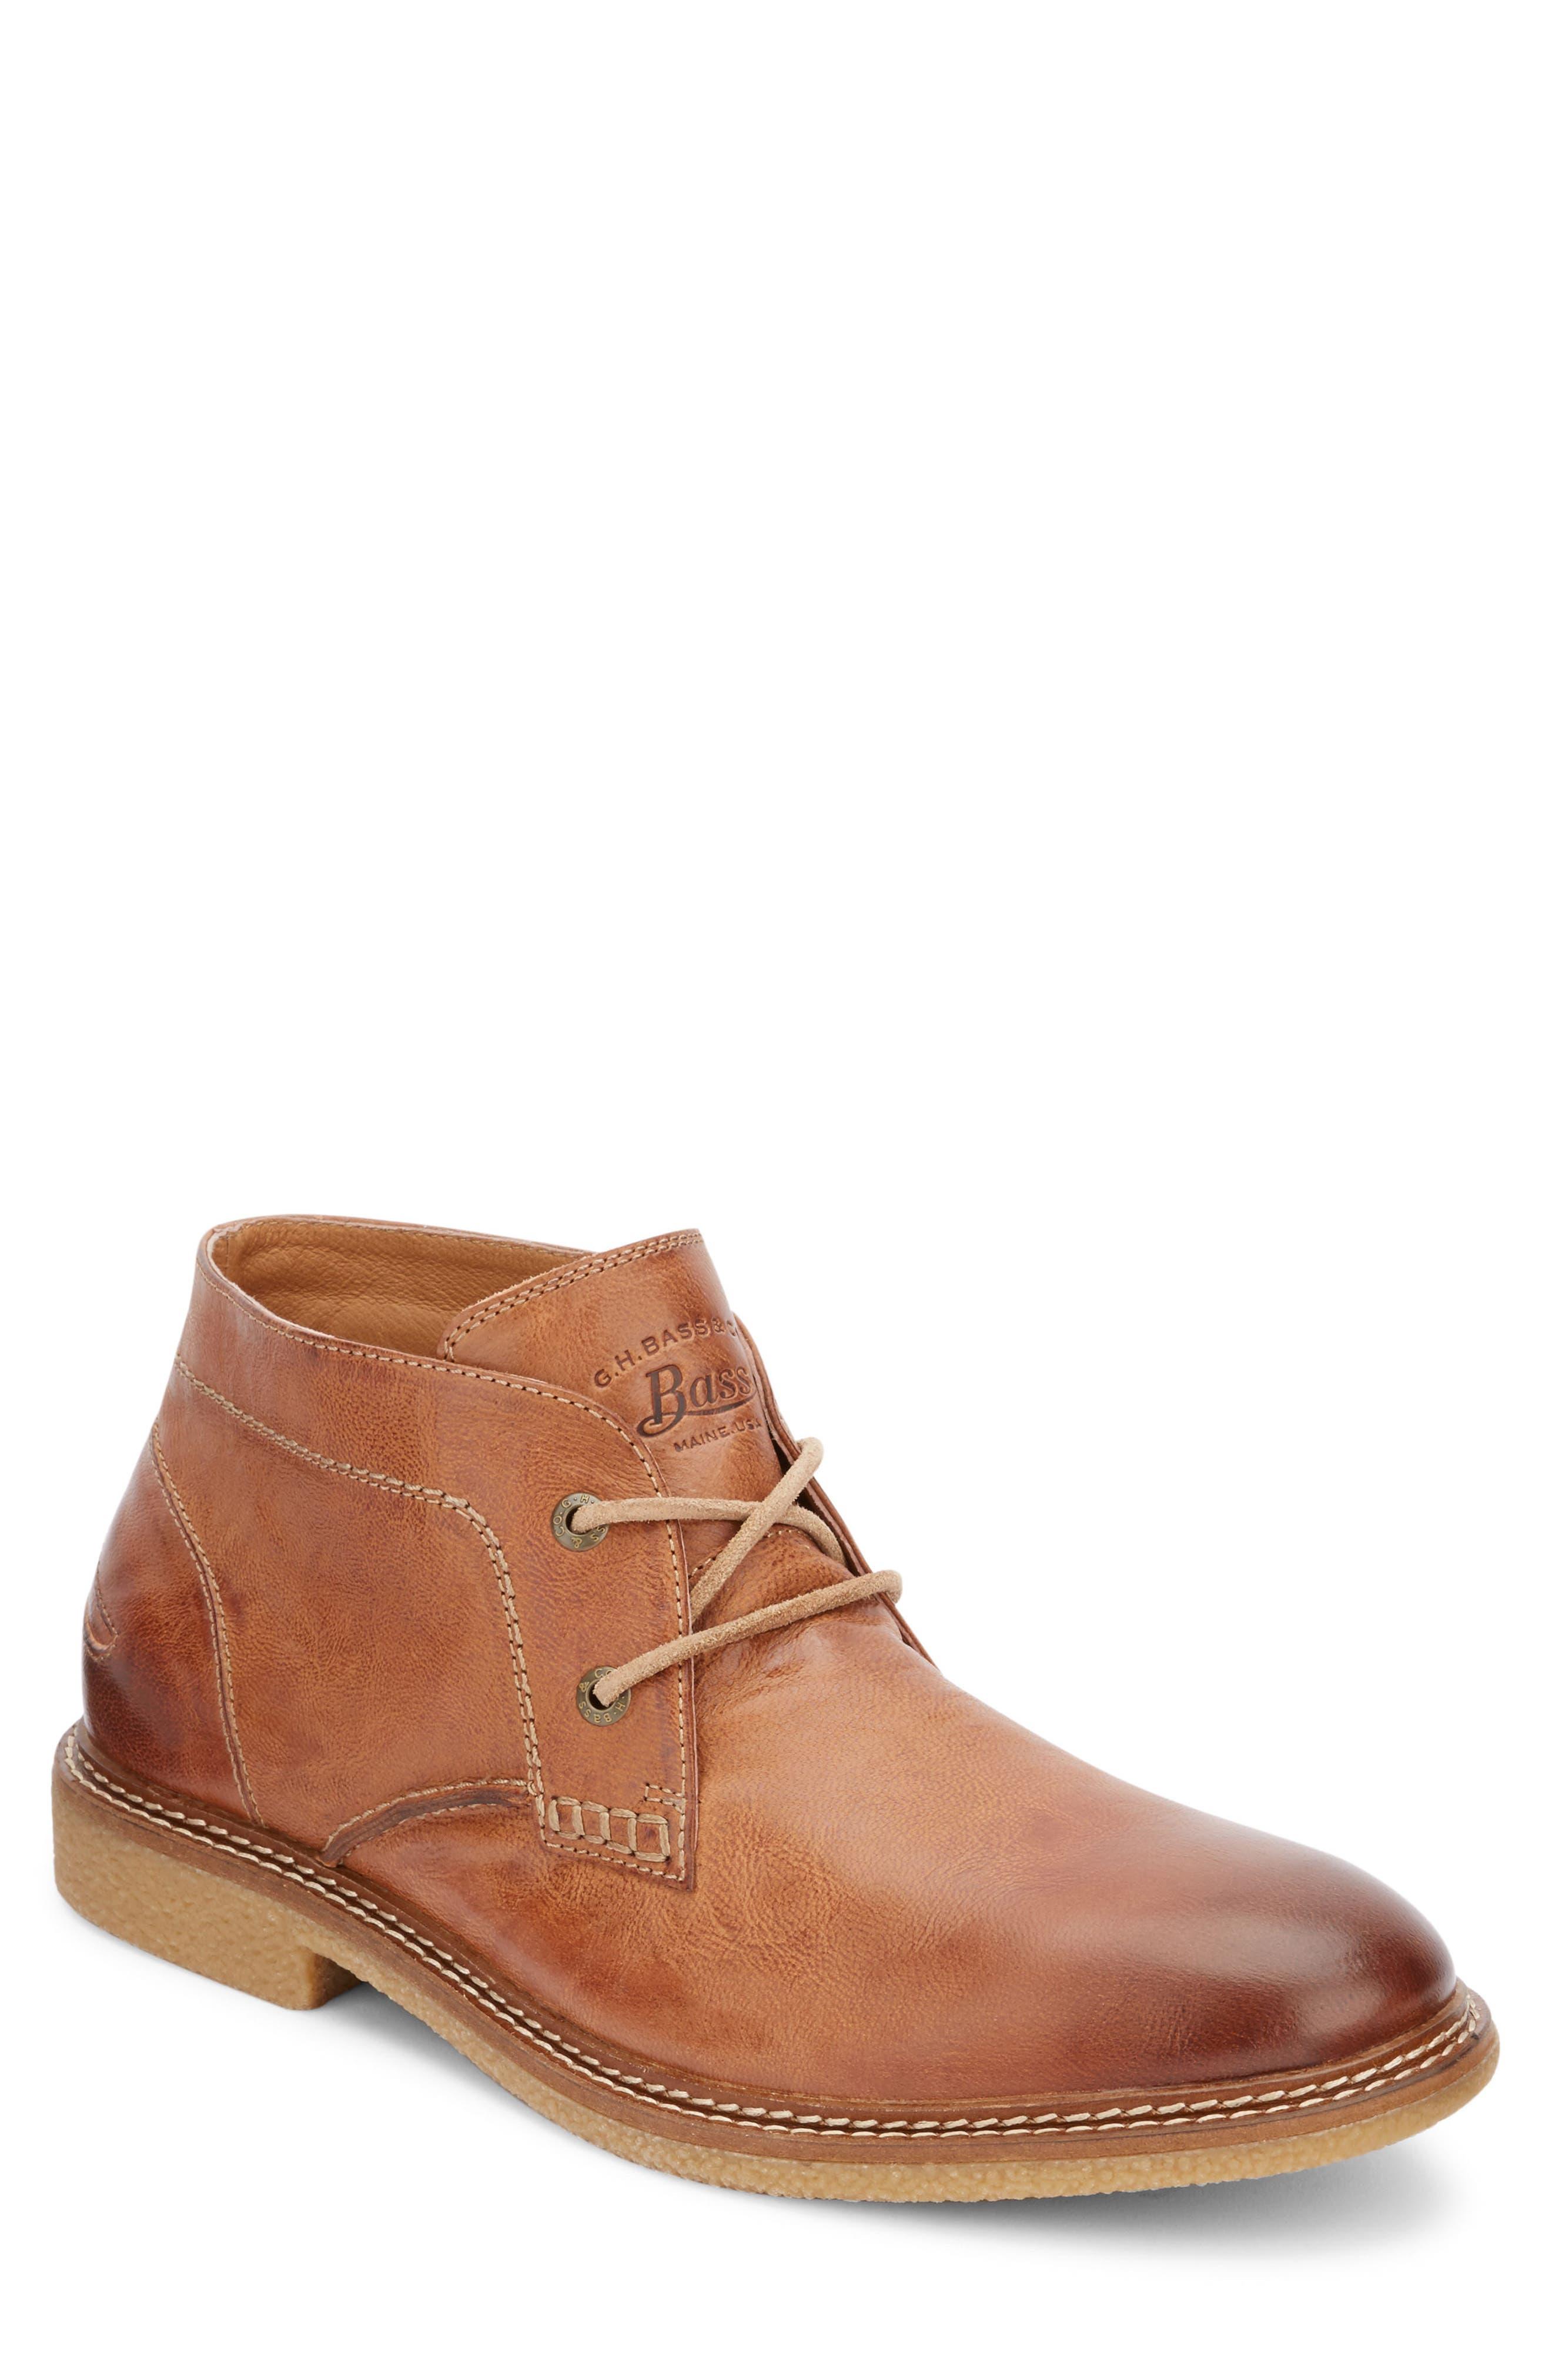 'Bennett' Chukka Boot,                         Main,                         color, Tan Leather